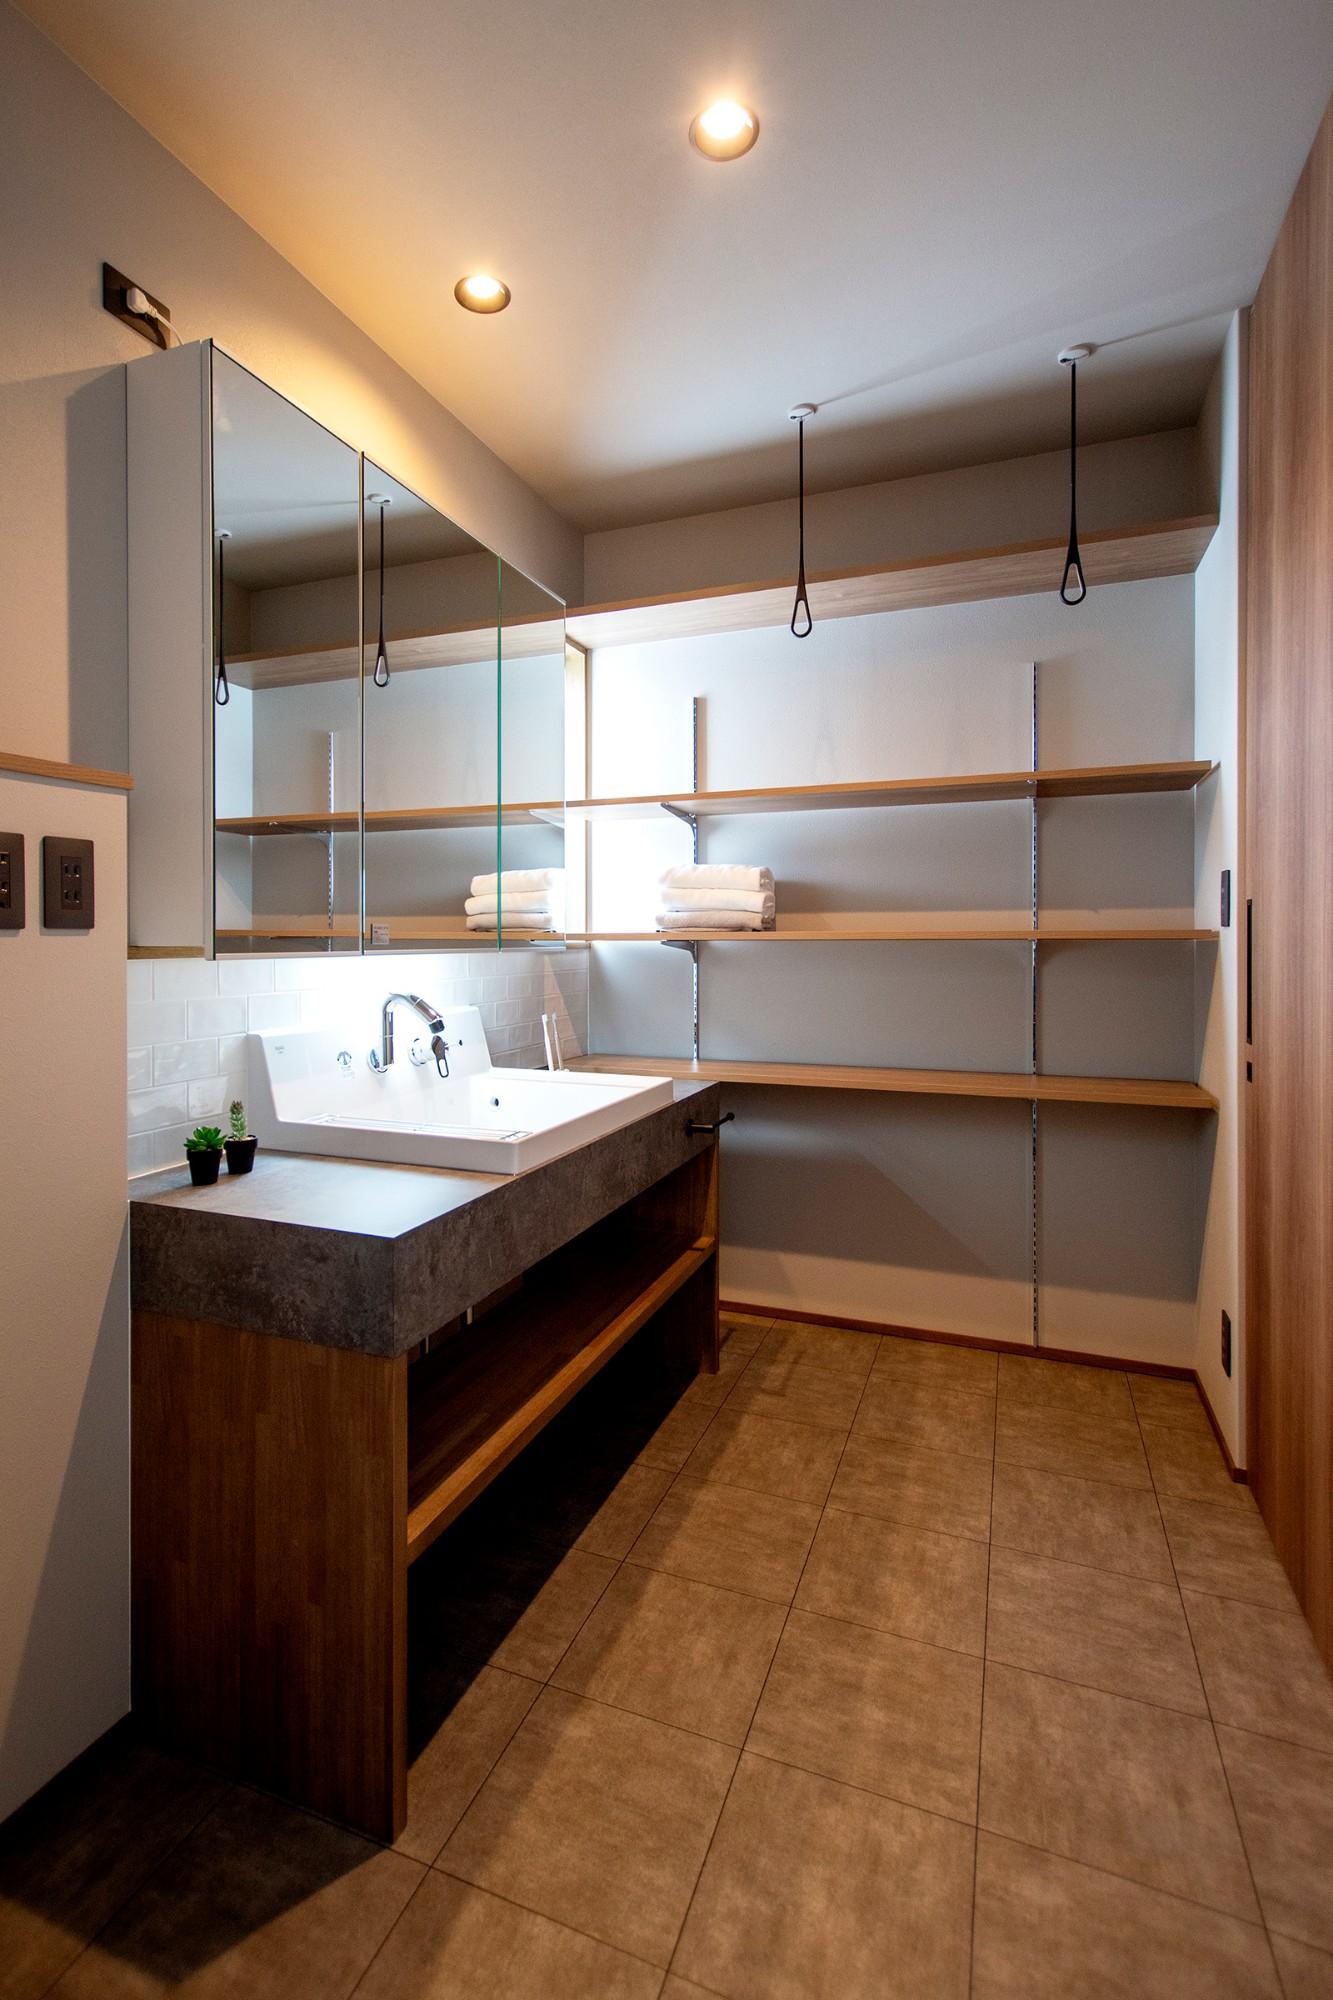 DETAIL HOME(ディテールホーム)「光が降りそそぐ開放感のある家」のシンプル・ナチュラルな洗面所・脱衣所の実例写真